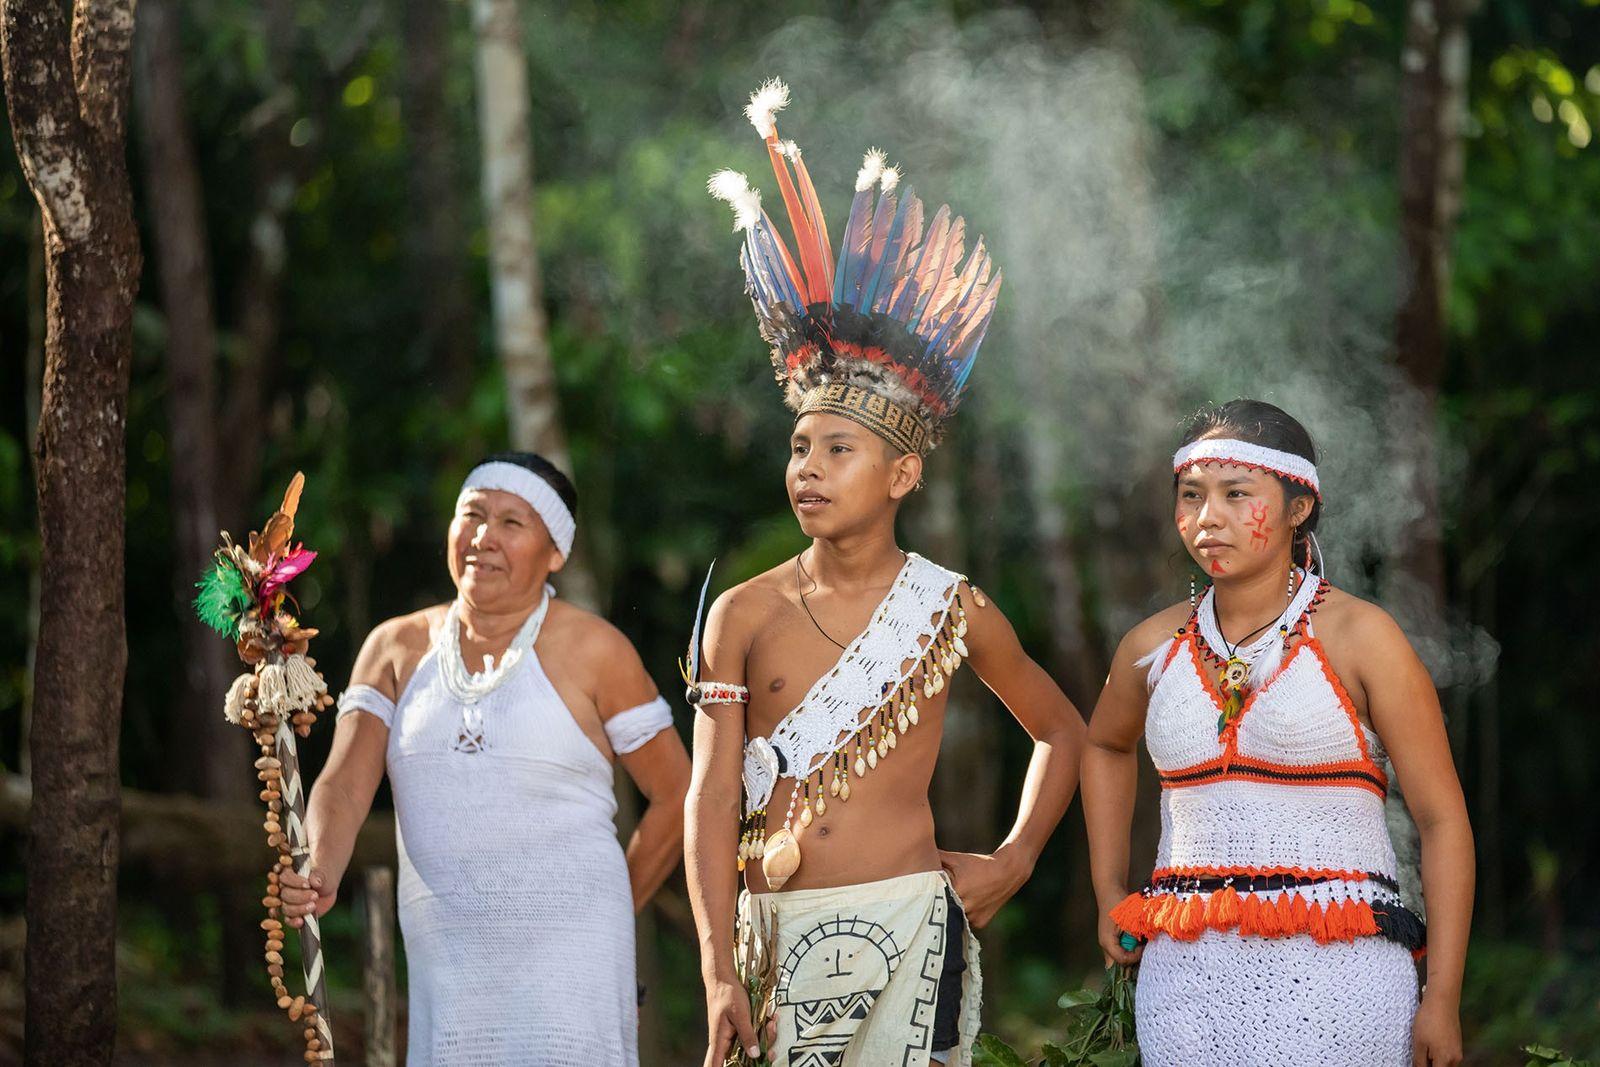 Amerindian villagers demonstrating traditional ways  of life at Makushi Cultural Village.